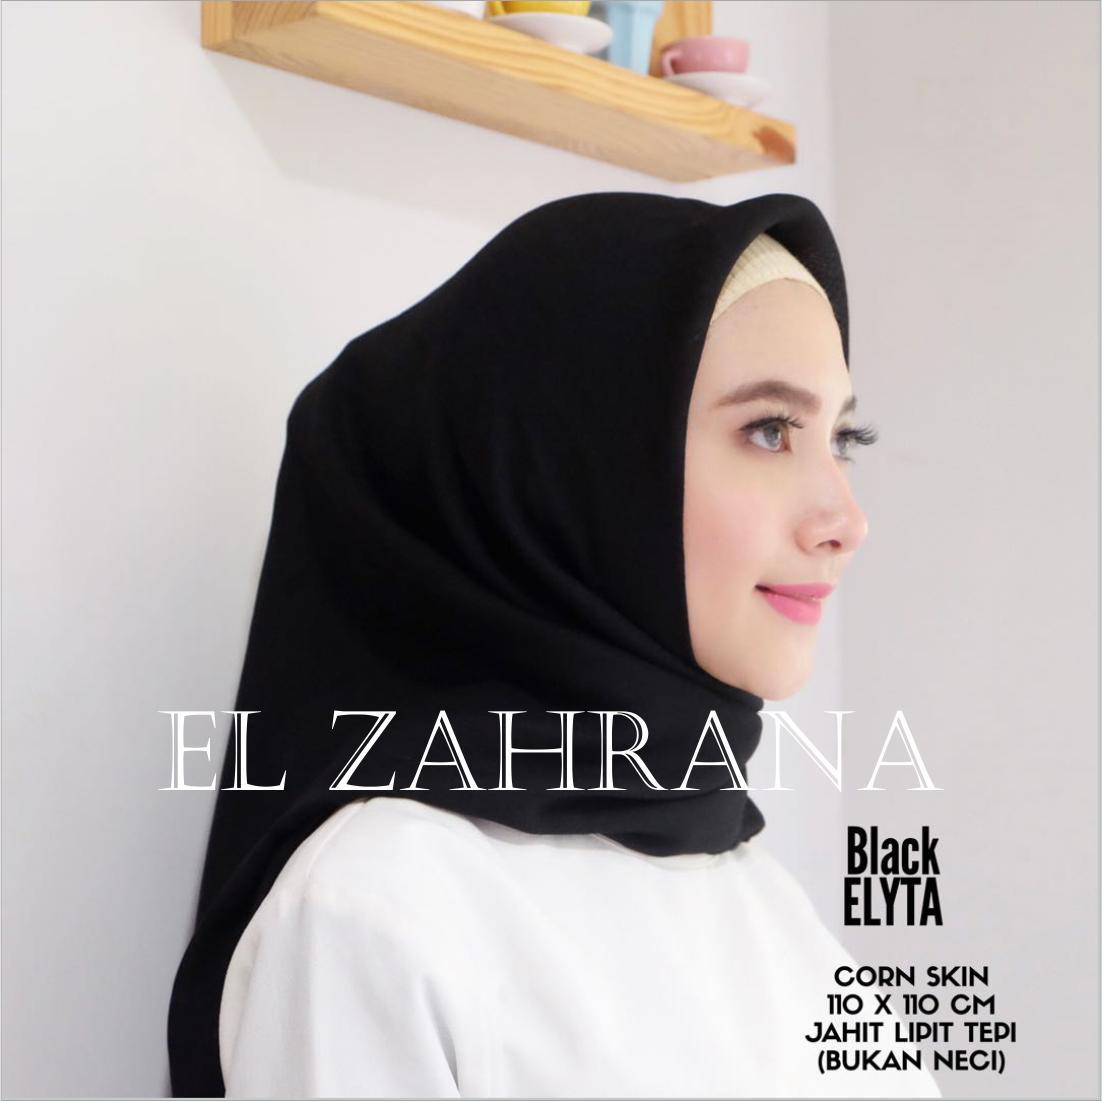 El Zahrana Hijab Square - Kerudung Segi Empat - Hijab Segi Empat - Hijab Polos - Jilbab Segi Empat Polos Corn Skin - Marbel